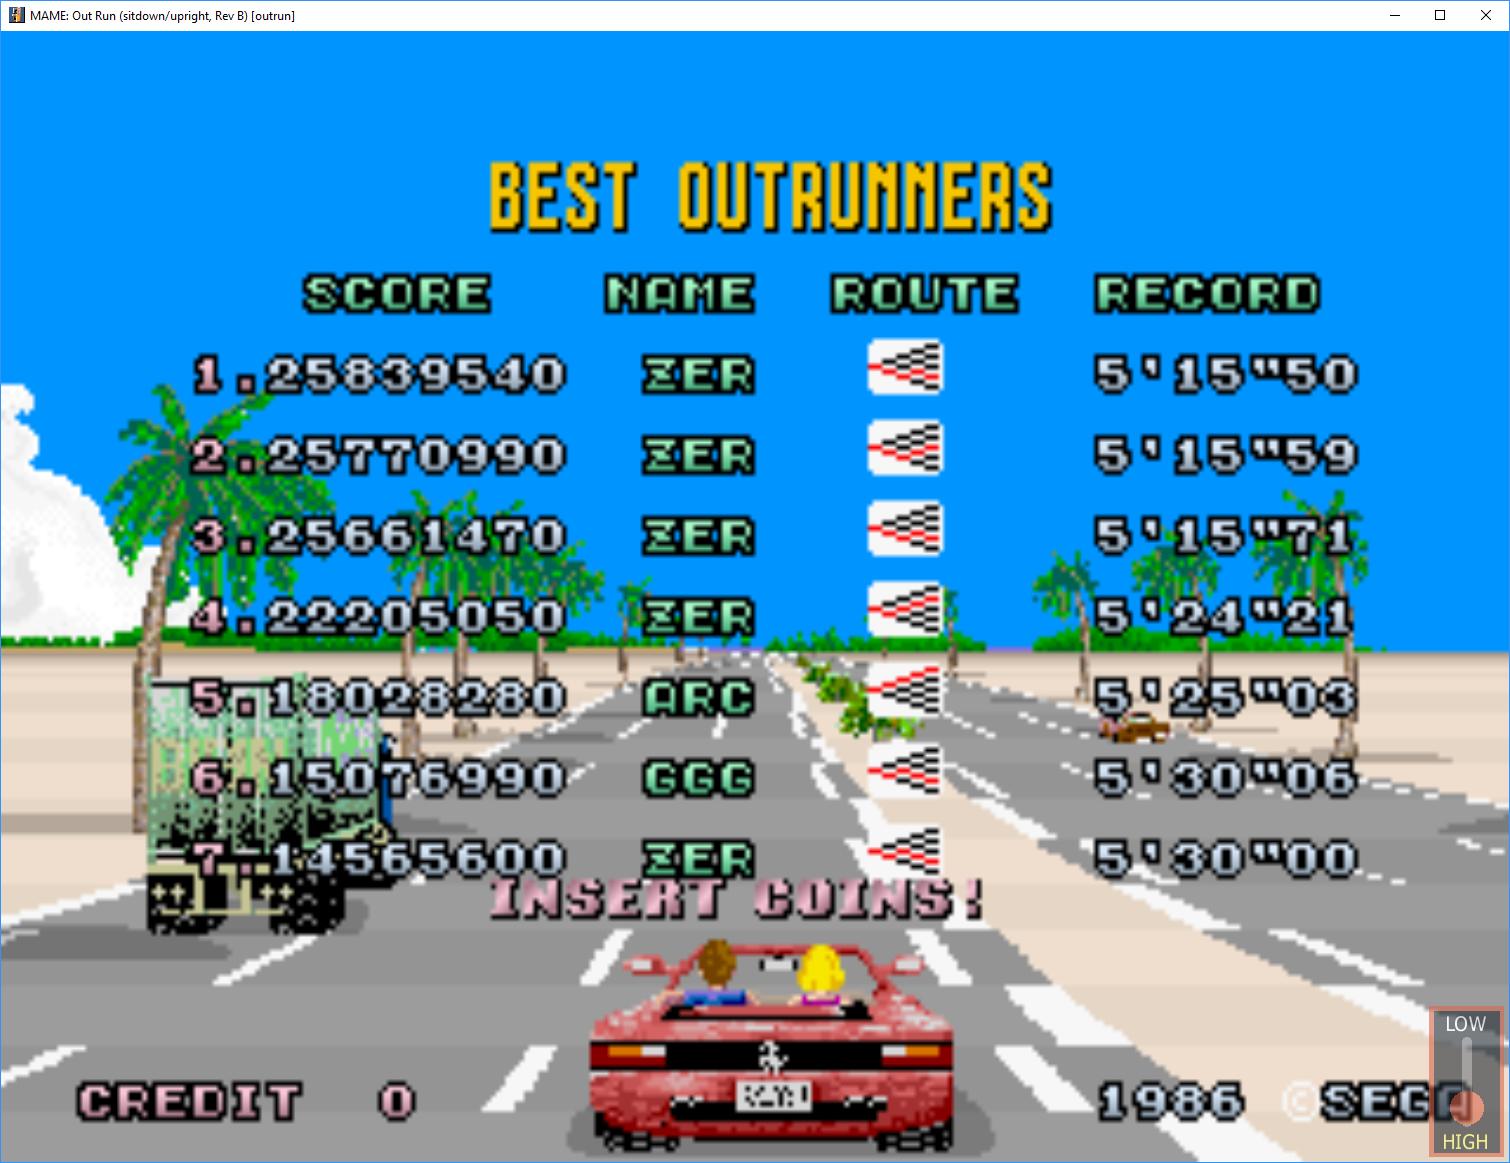 Outrun (Arcade Emulated / M A M E ) high score by zerOpRiME